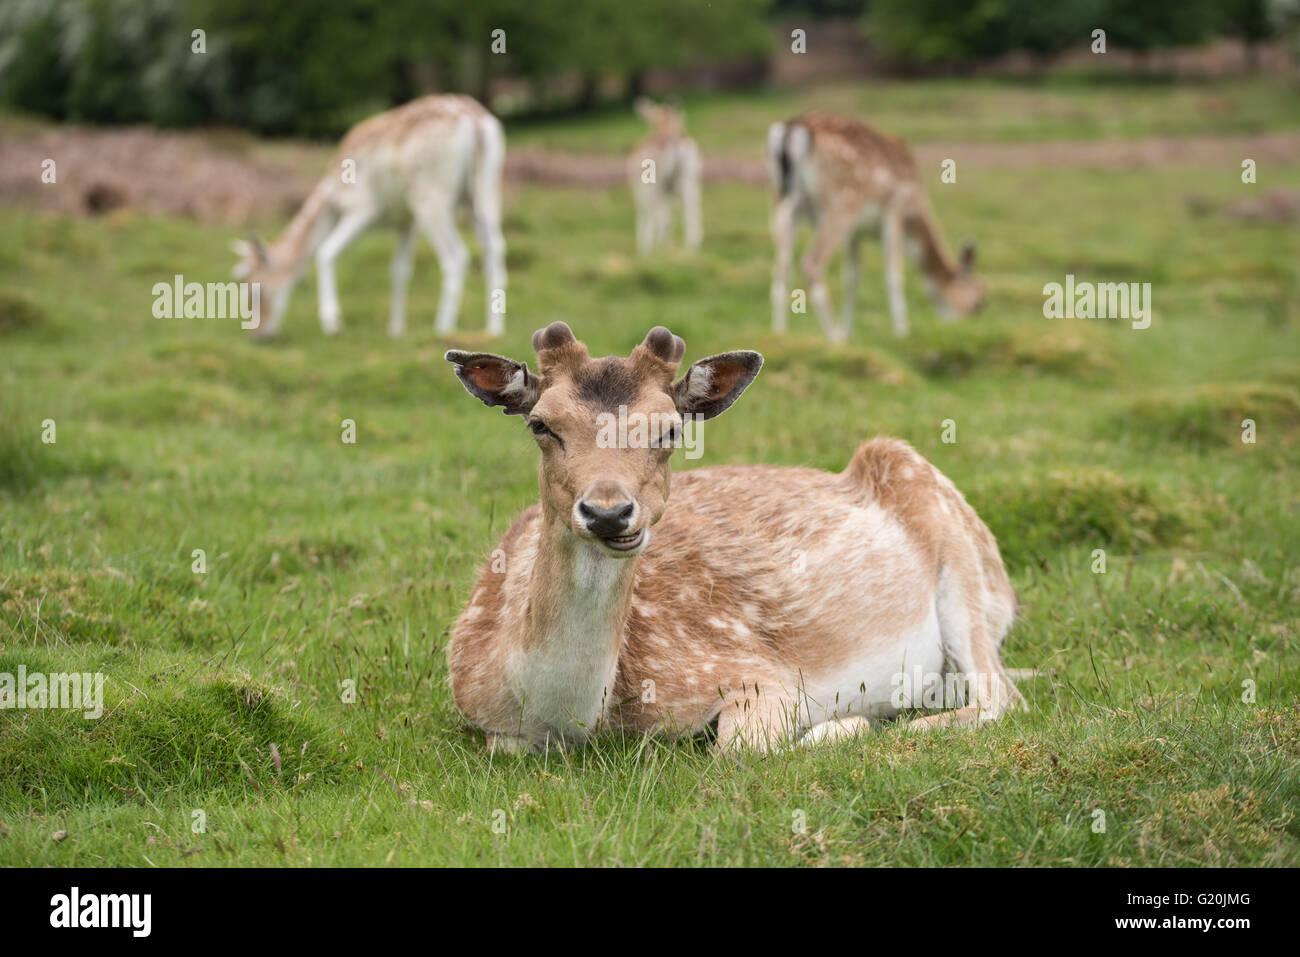 Deer laying down - Stock Image